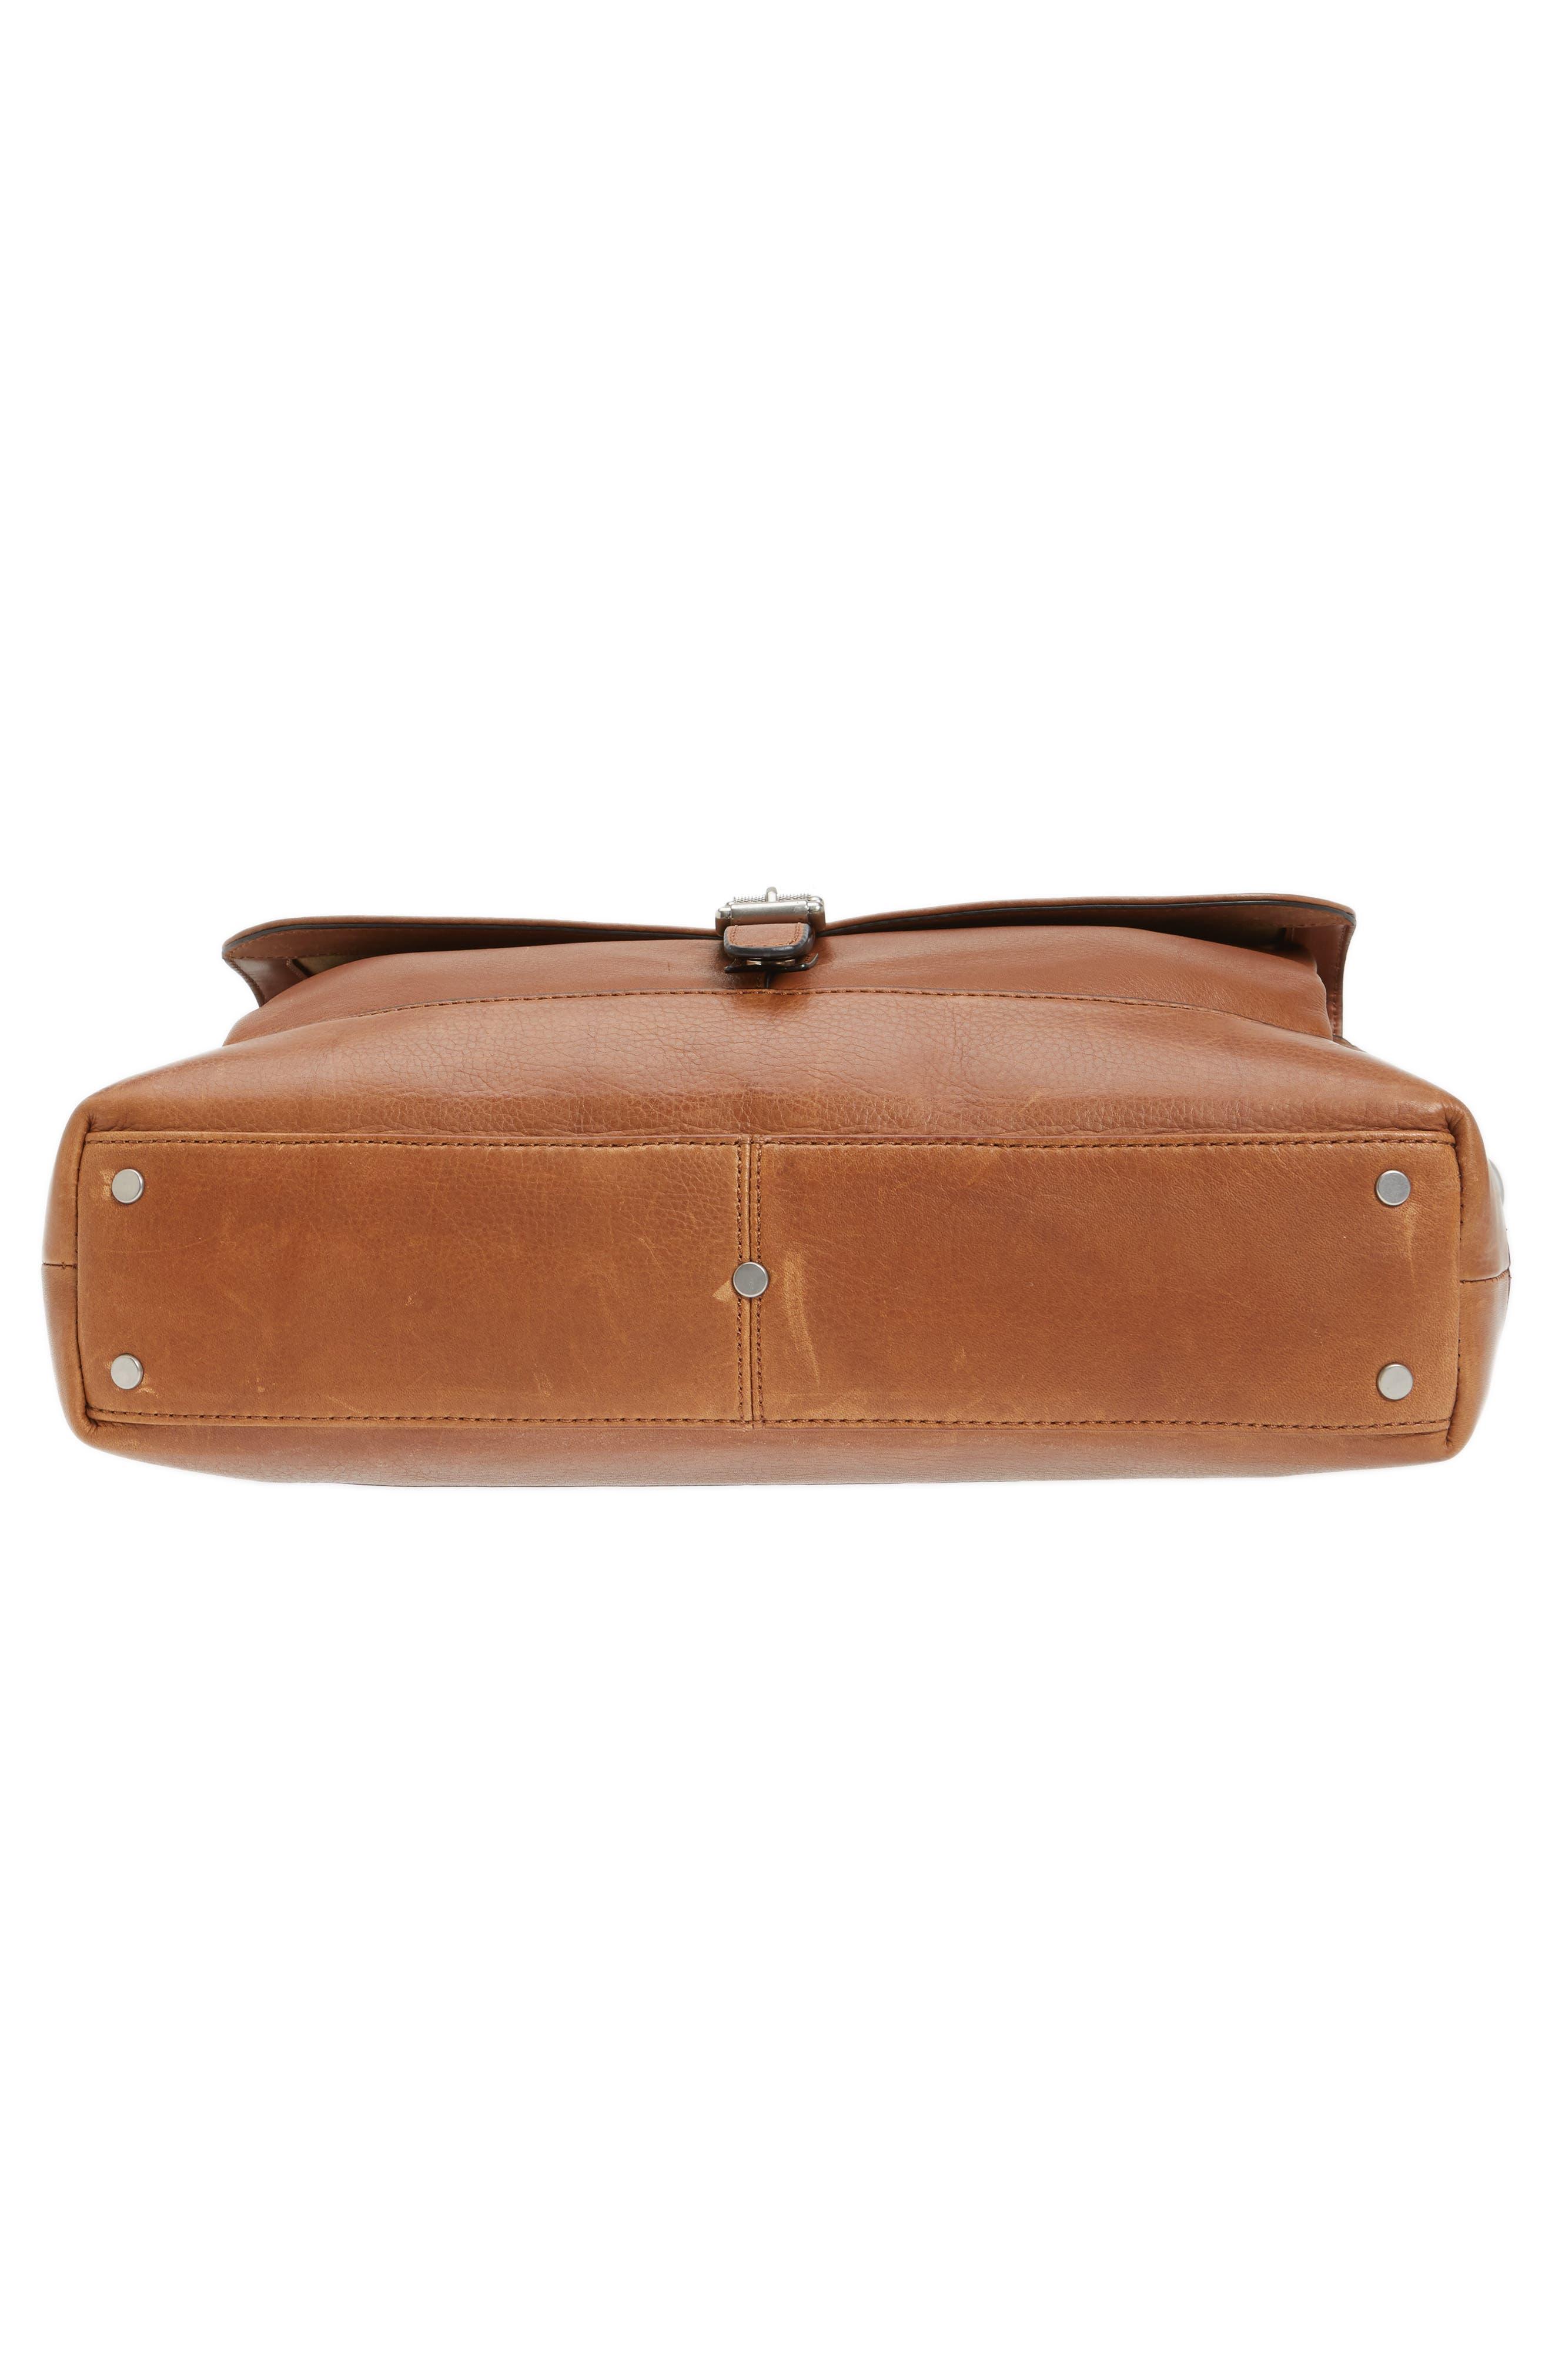 FRYE, Oliver Leather Briefcase, Alternate thumbnail 6, color, 235